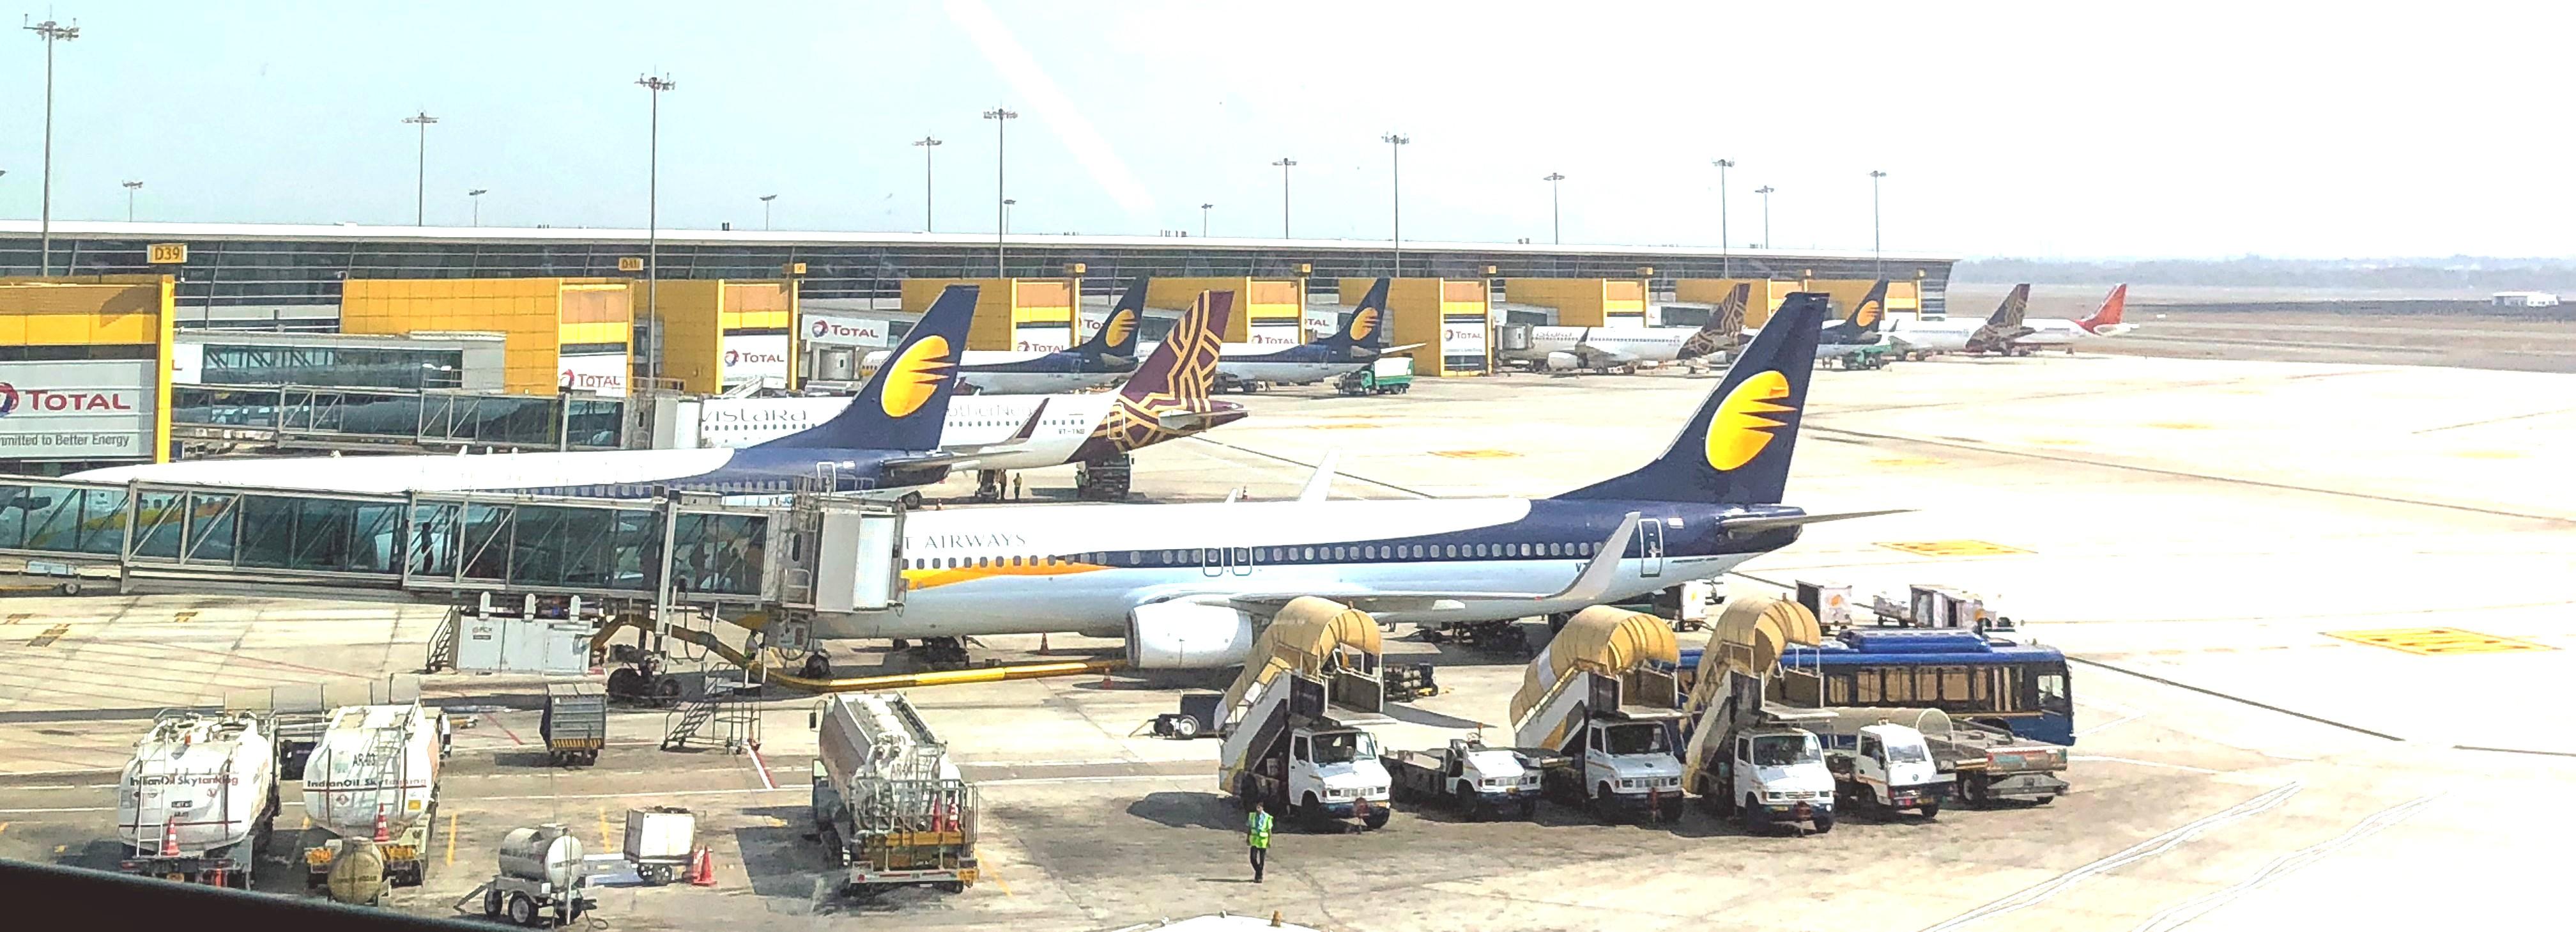 Comité acreedores futuro Jet Airways |